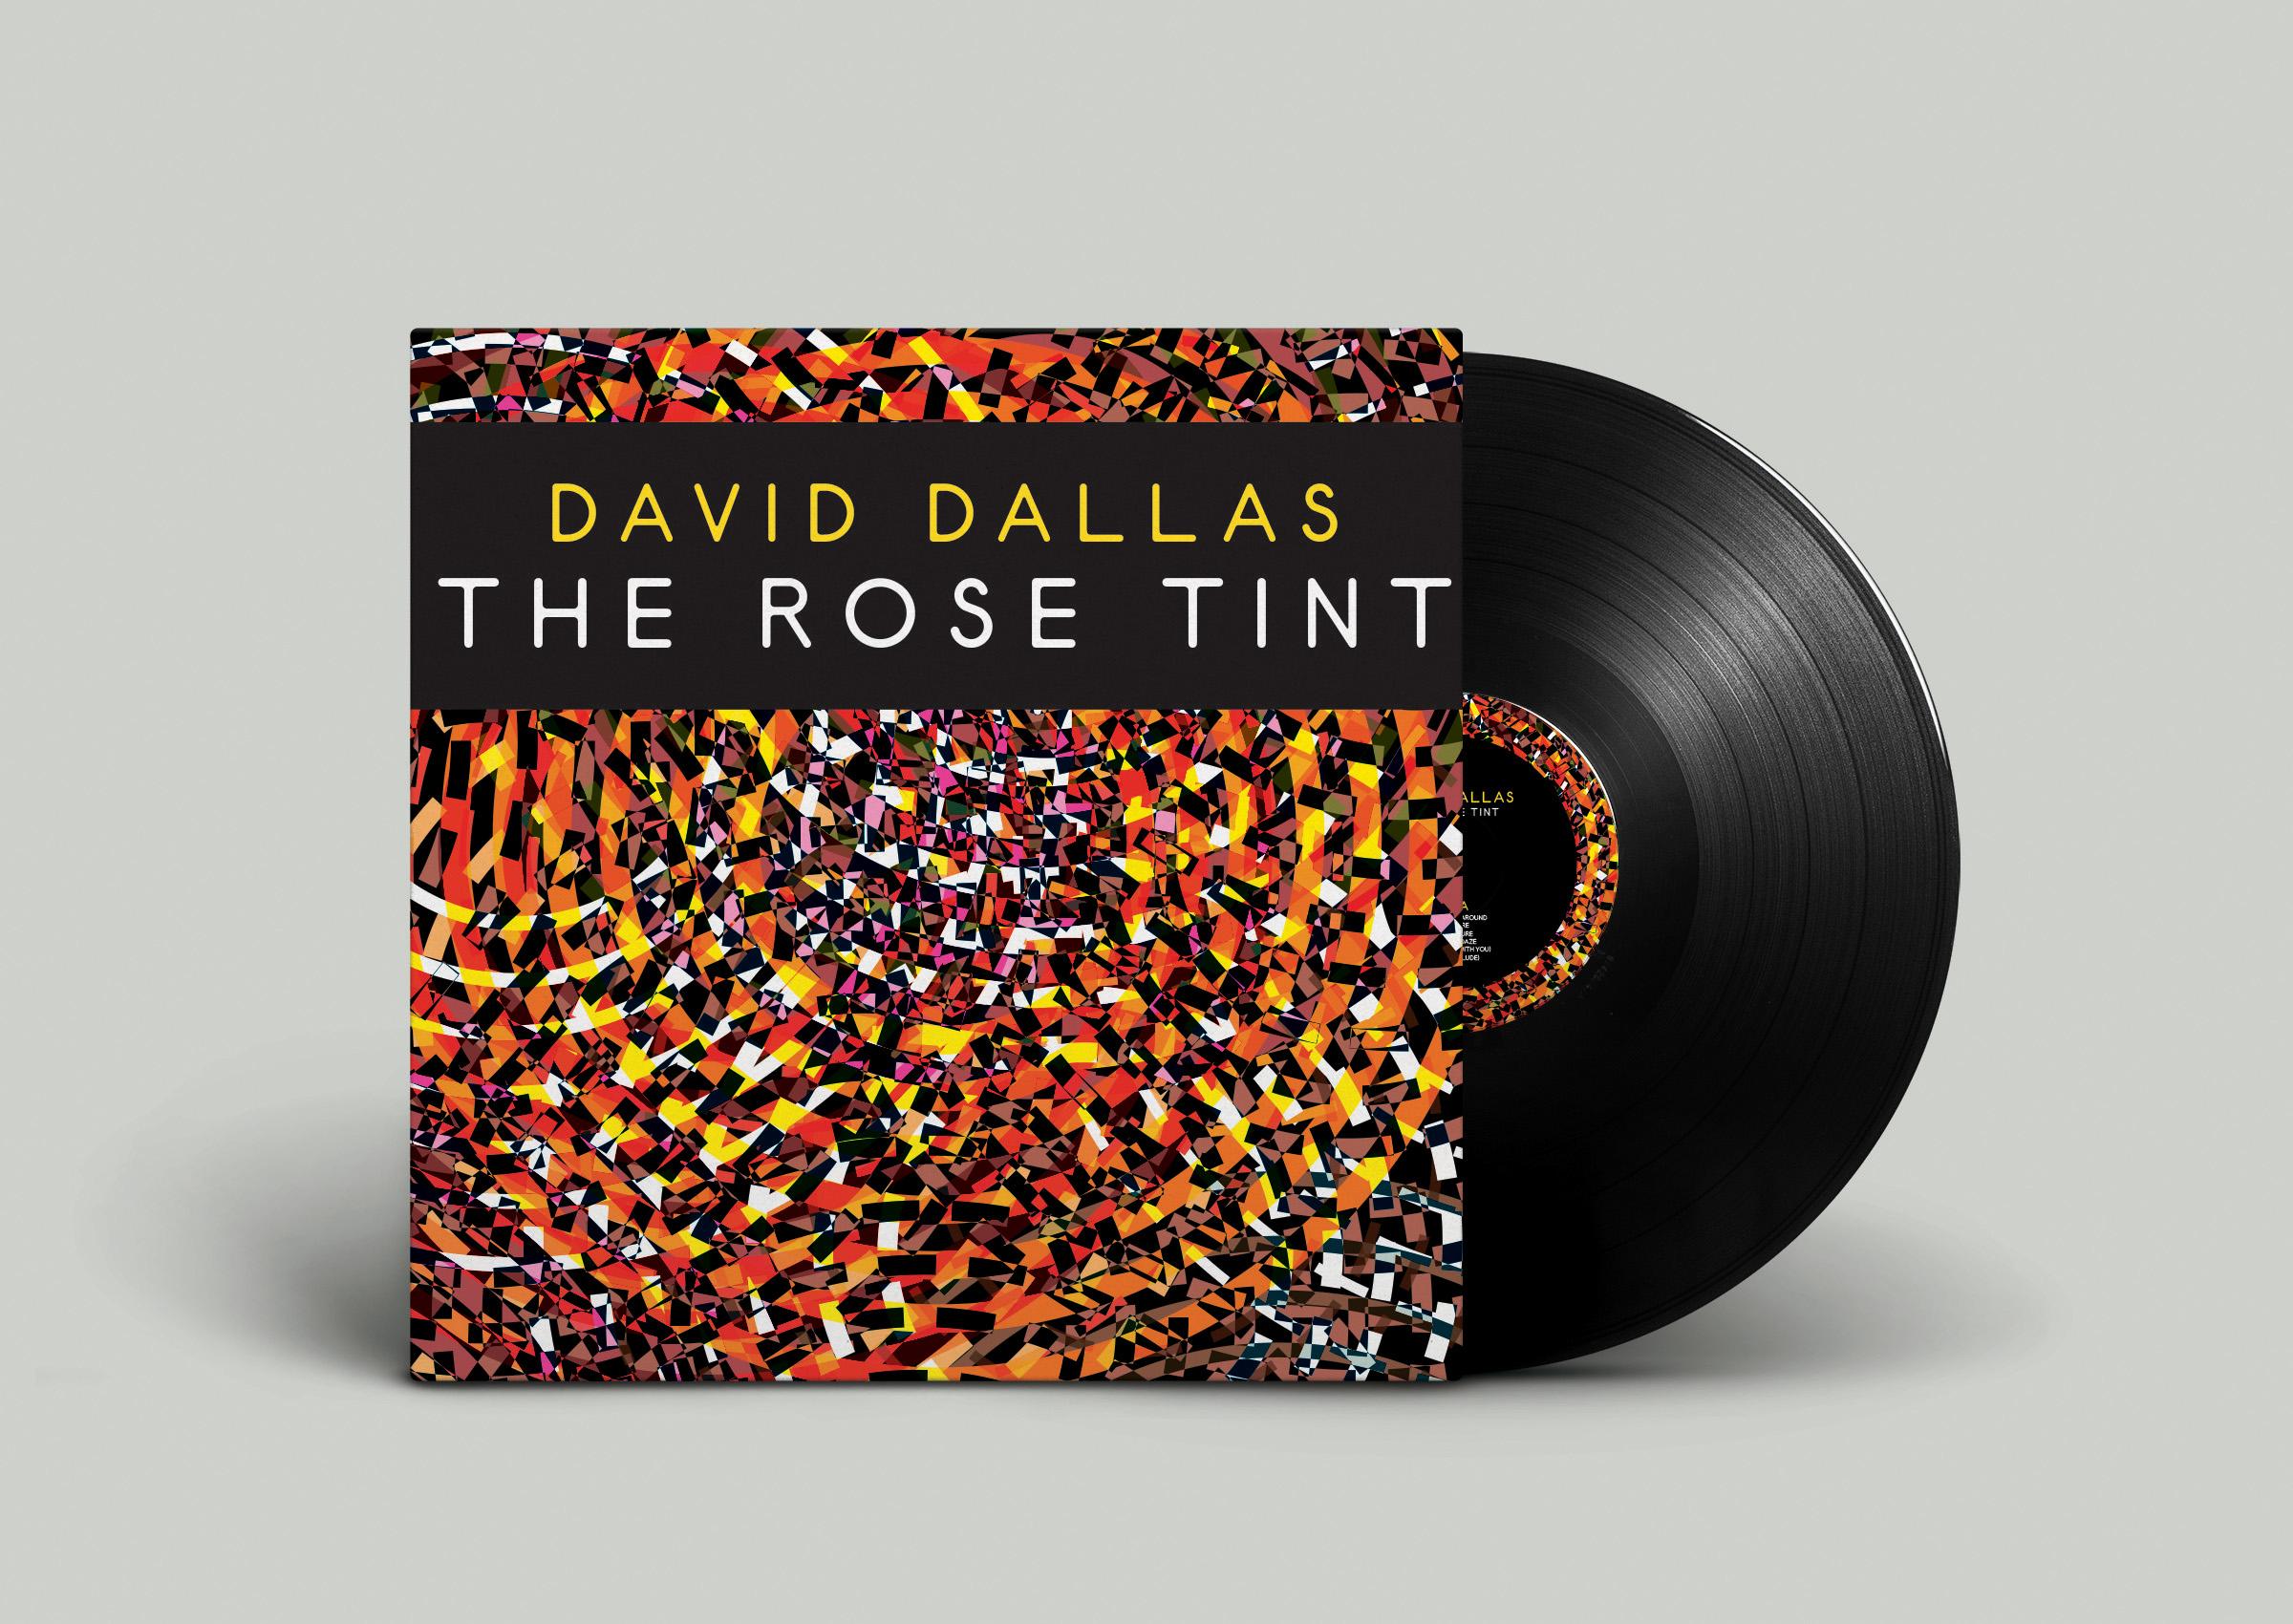 David Dallas - The Rose Tint   Vinyl cover for Dallas' The Rose Tint album.